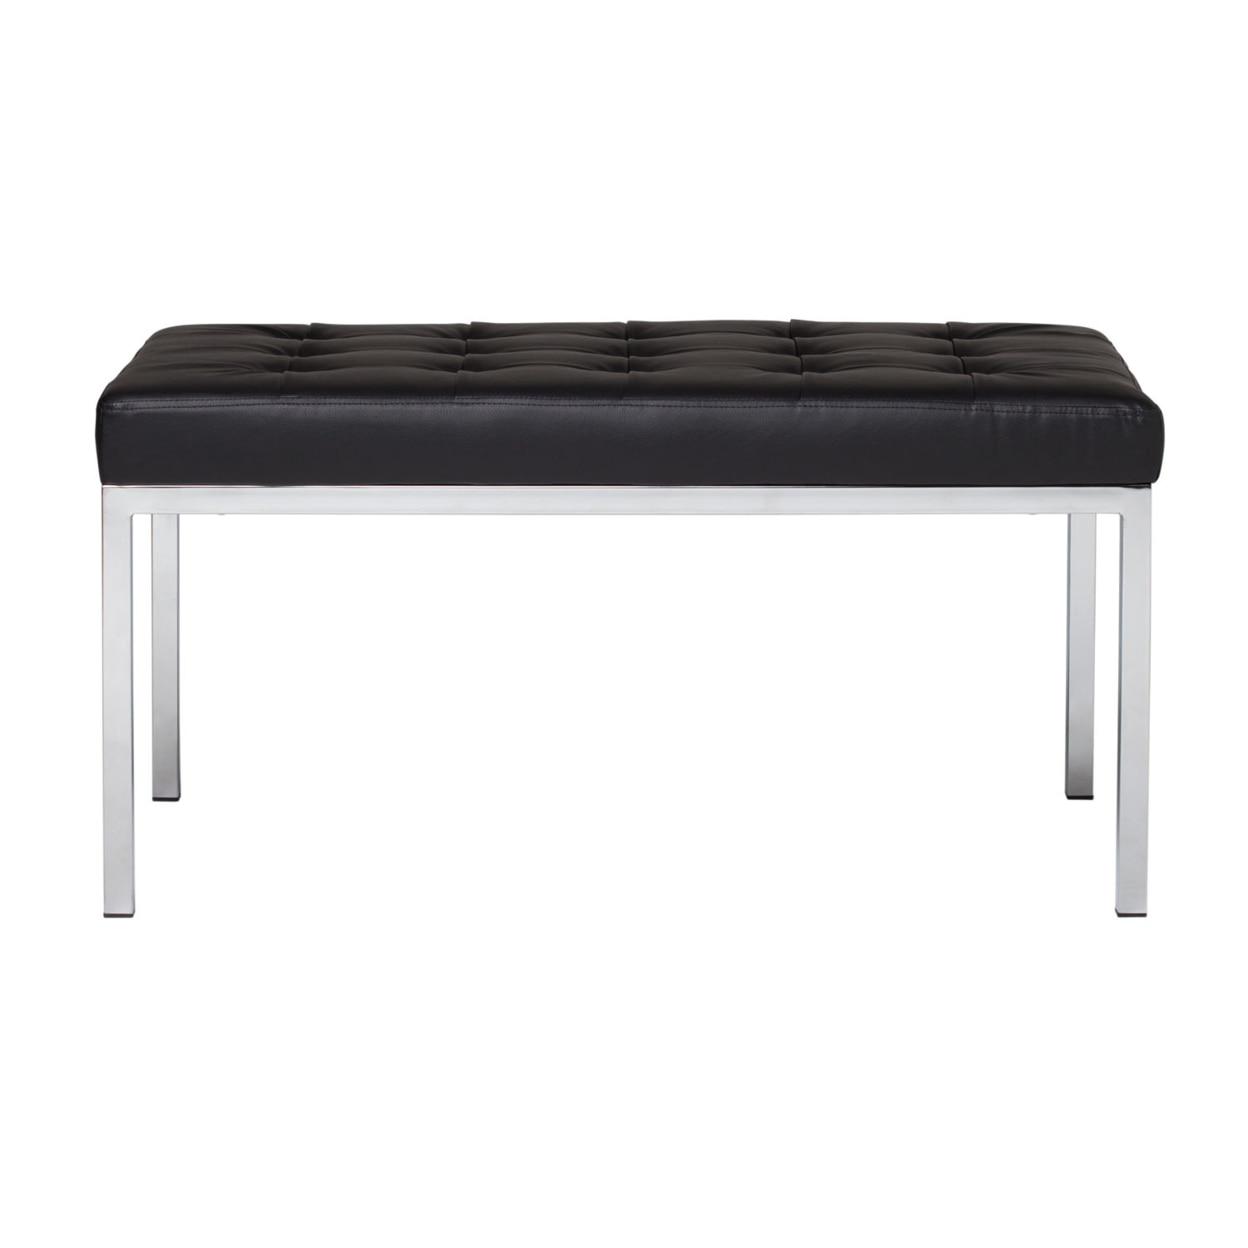 Studio Designs Home Office Lintel 35 Bench Bonded Leather - Black